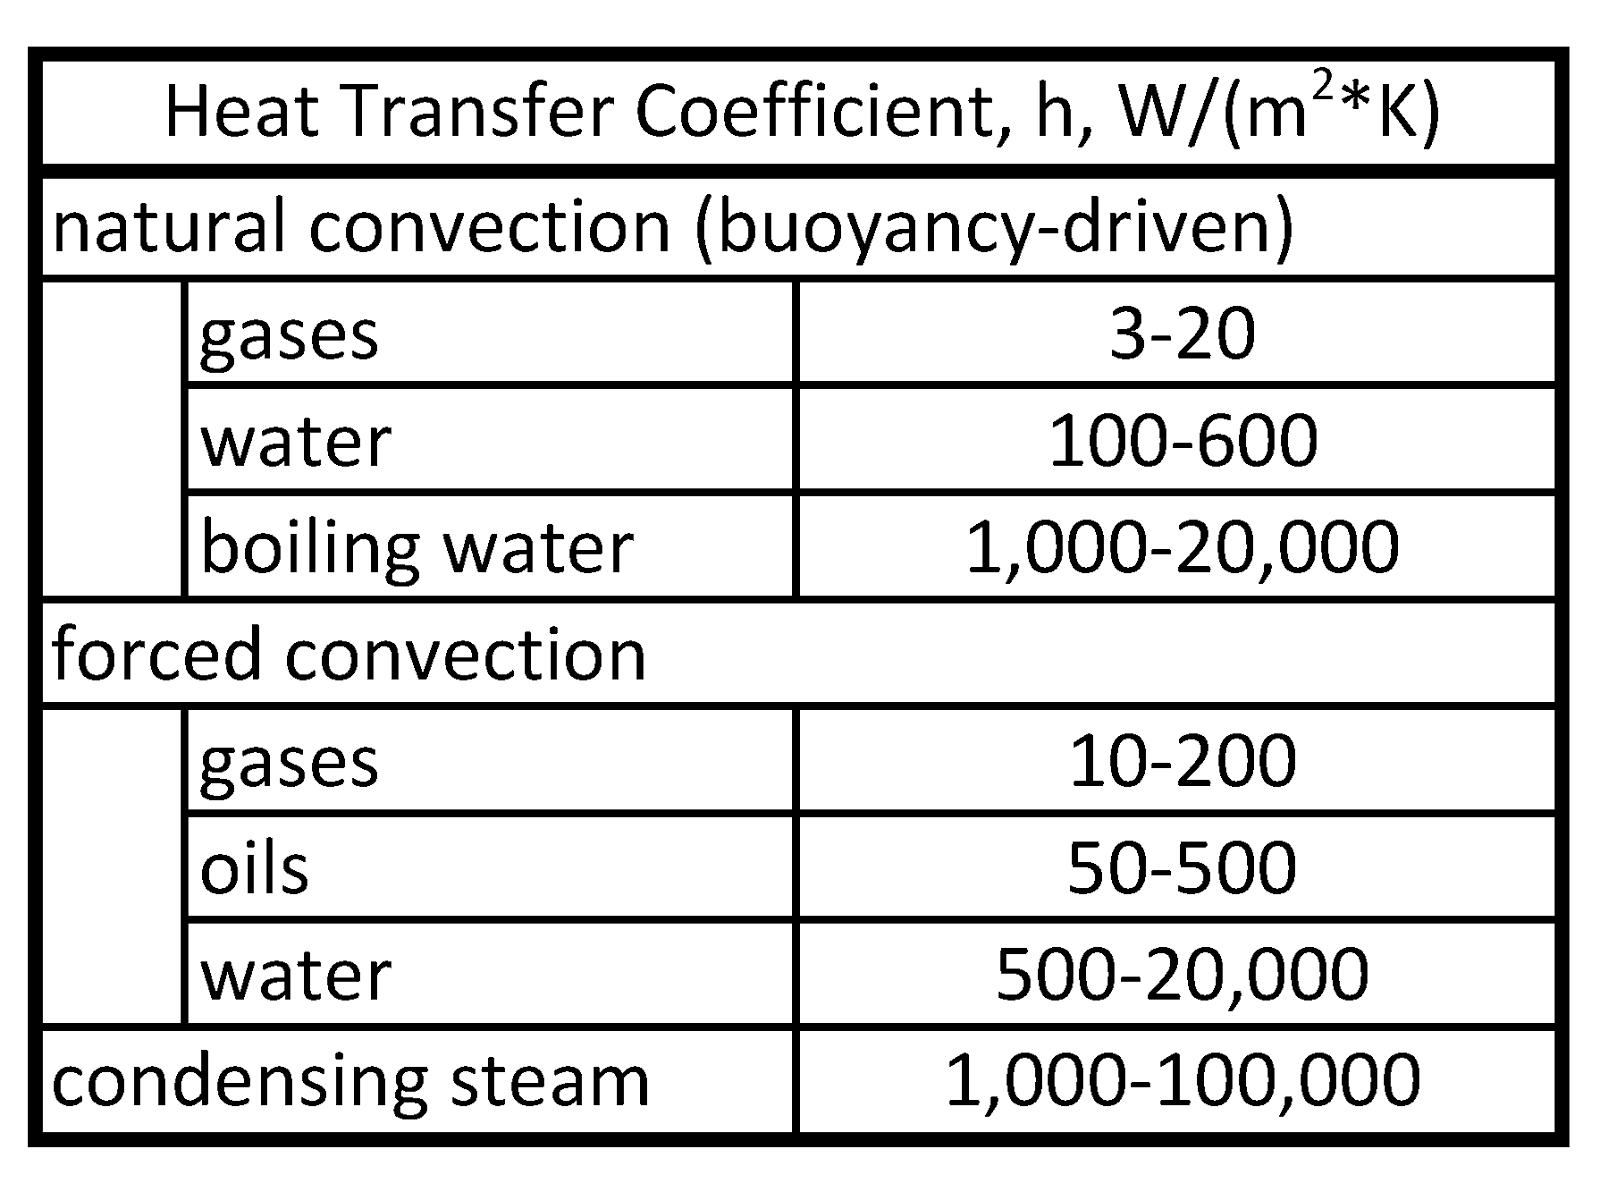 thermodynamics and heat transfer A heat transfer textbook / john h lienhard iv and john h lienhard v — 3rd ed   12 relation of heat transfer to thermodynamics           6 13 modes of.